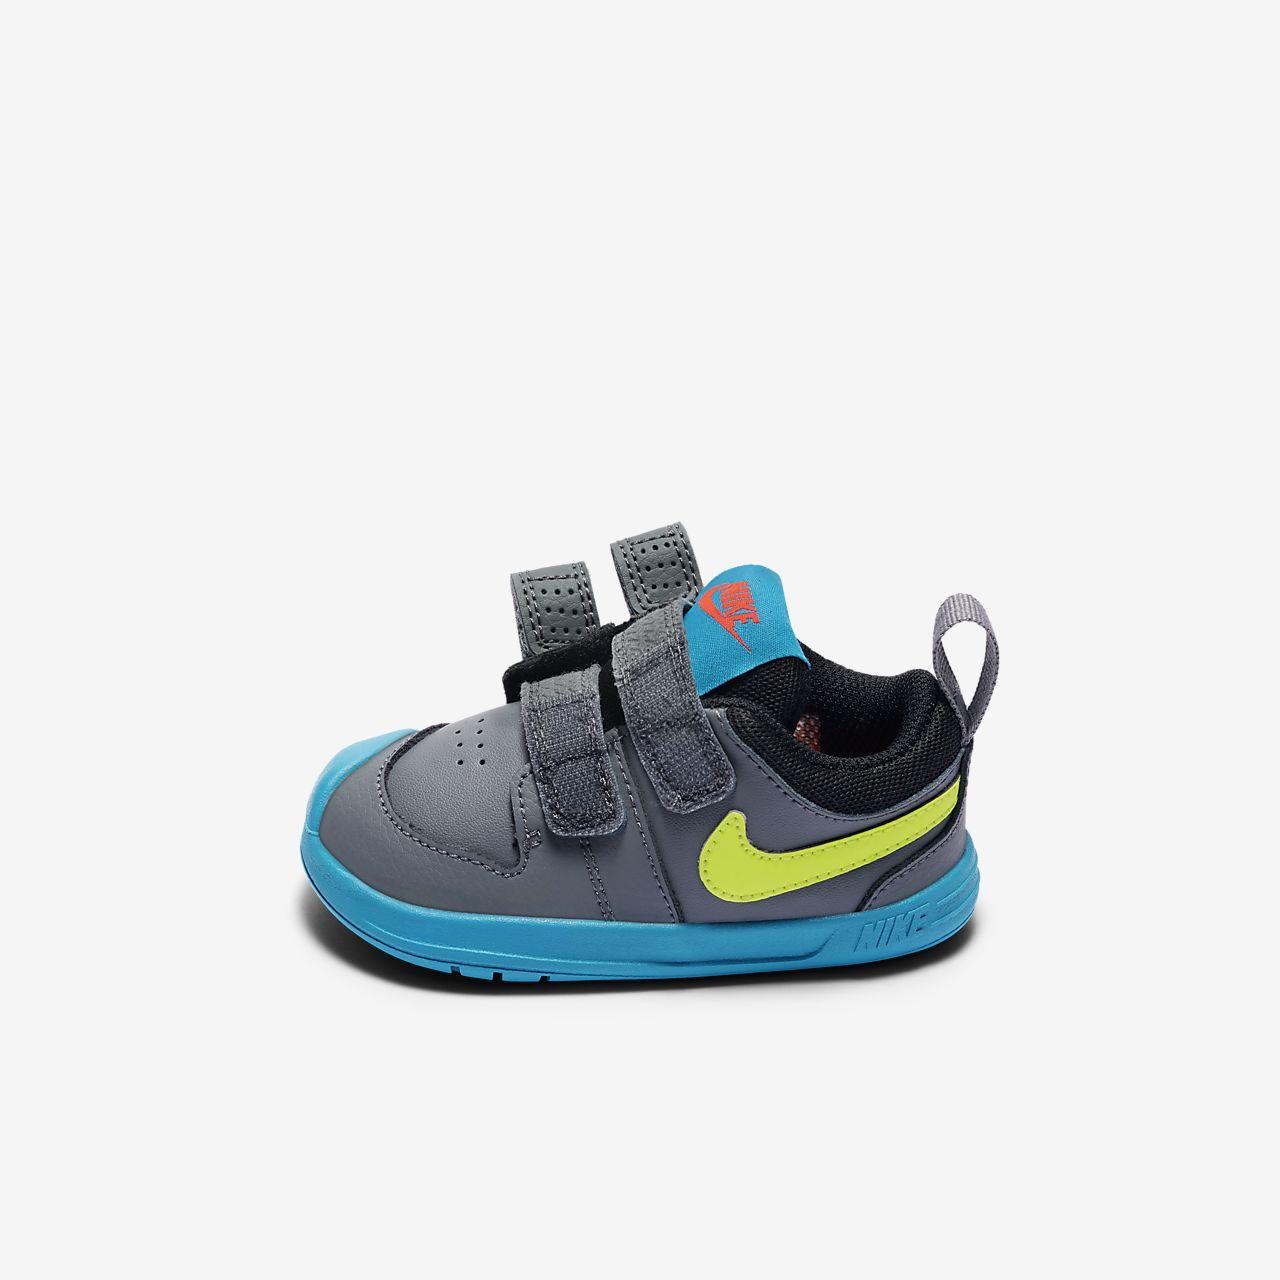 Sko Nike Pico 5 för babysmå barn